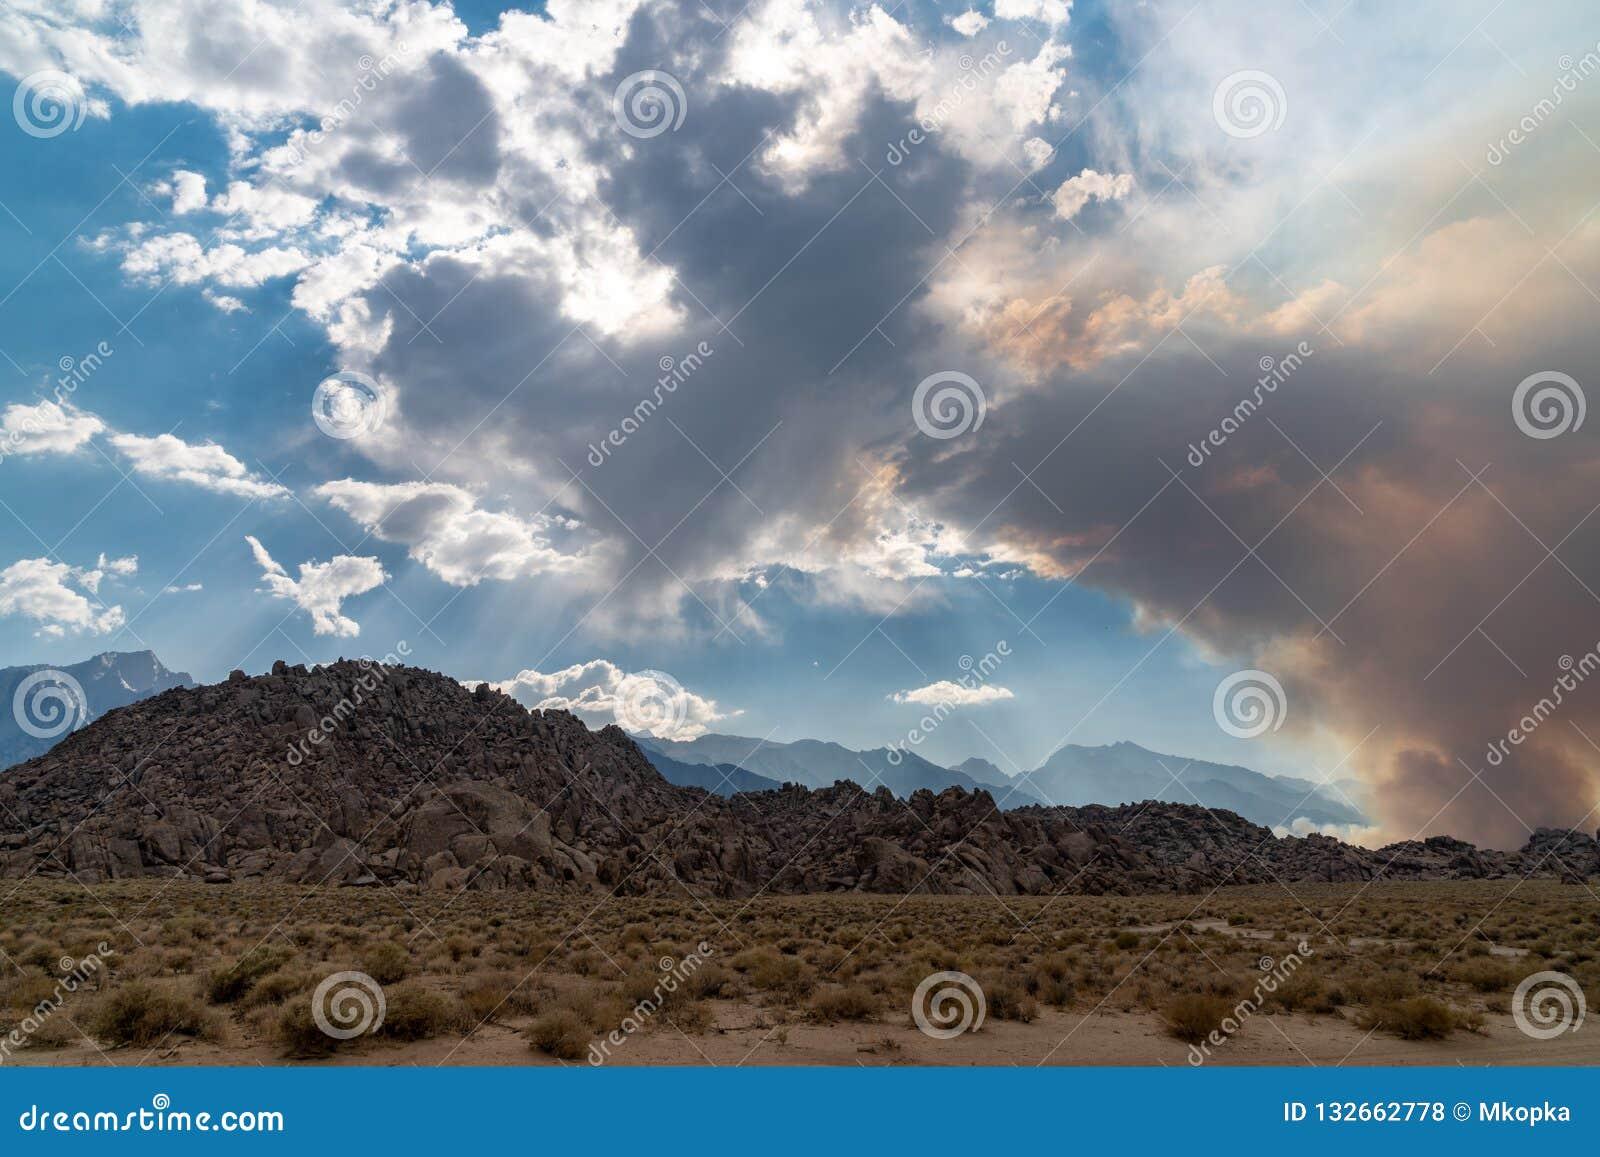 Anfänge des verheerenden Feuers in den Ost-Sierra Nevada -Bergen - Georges Fire